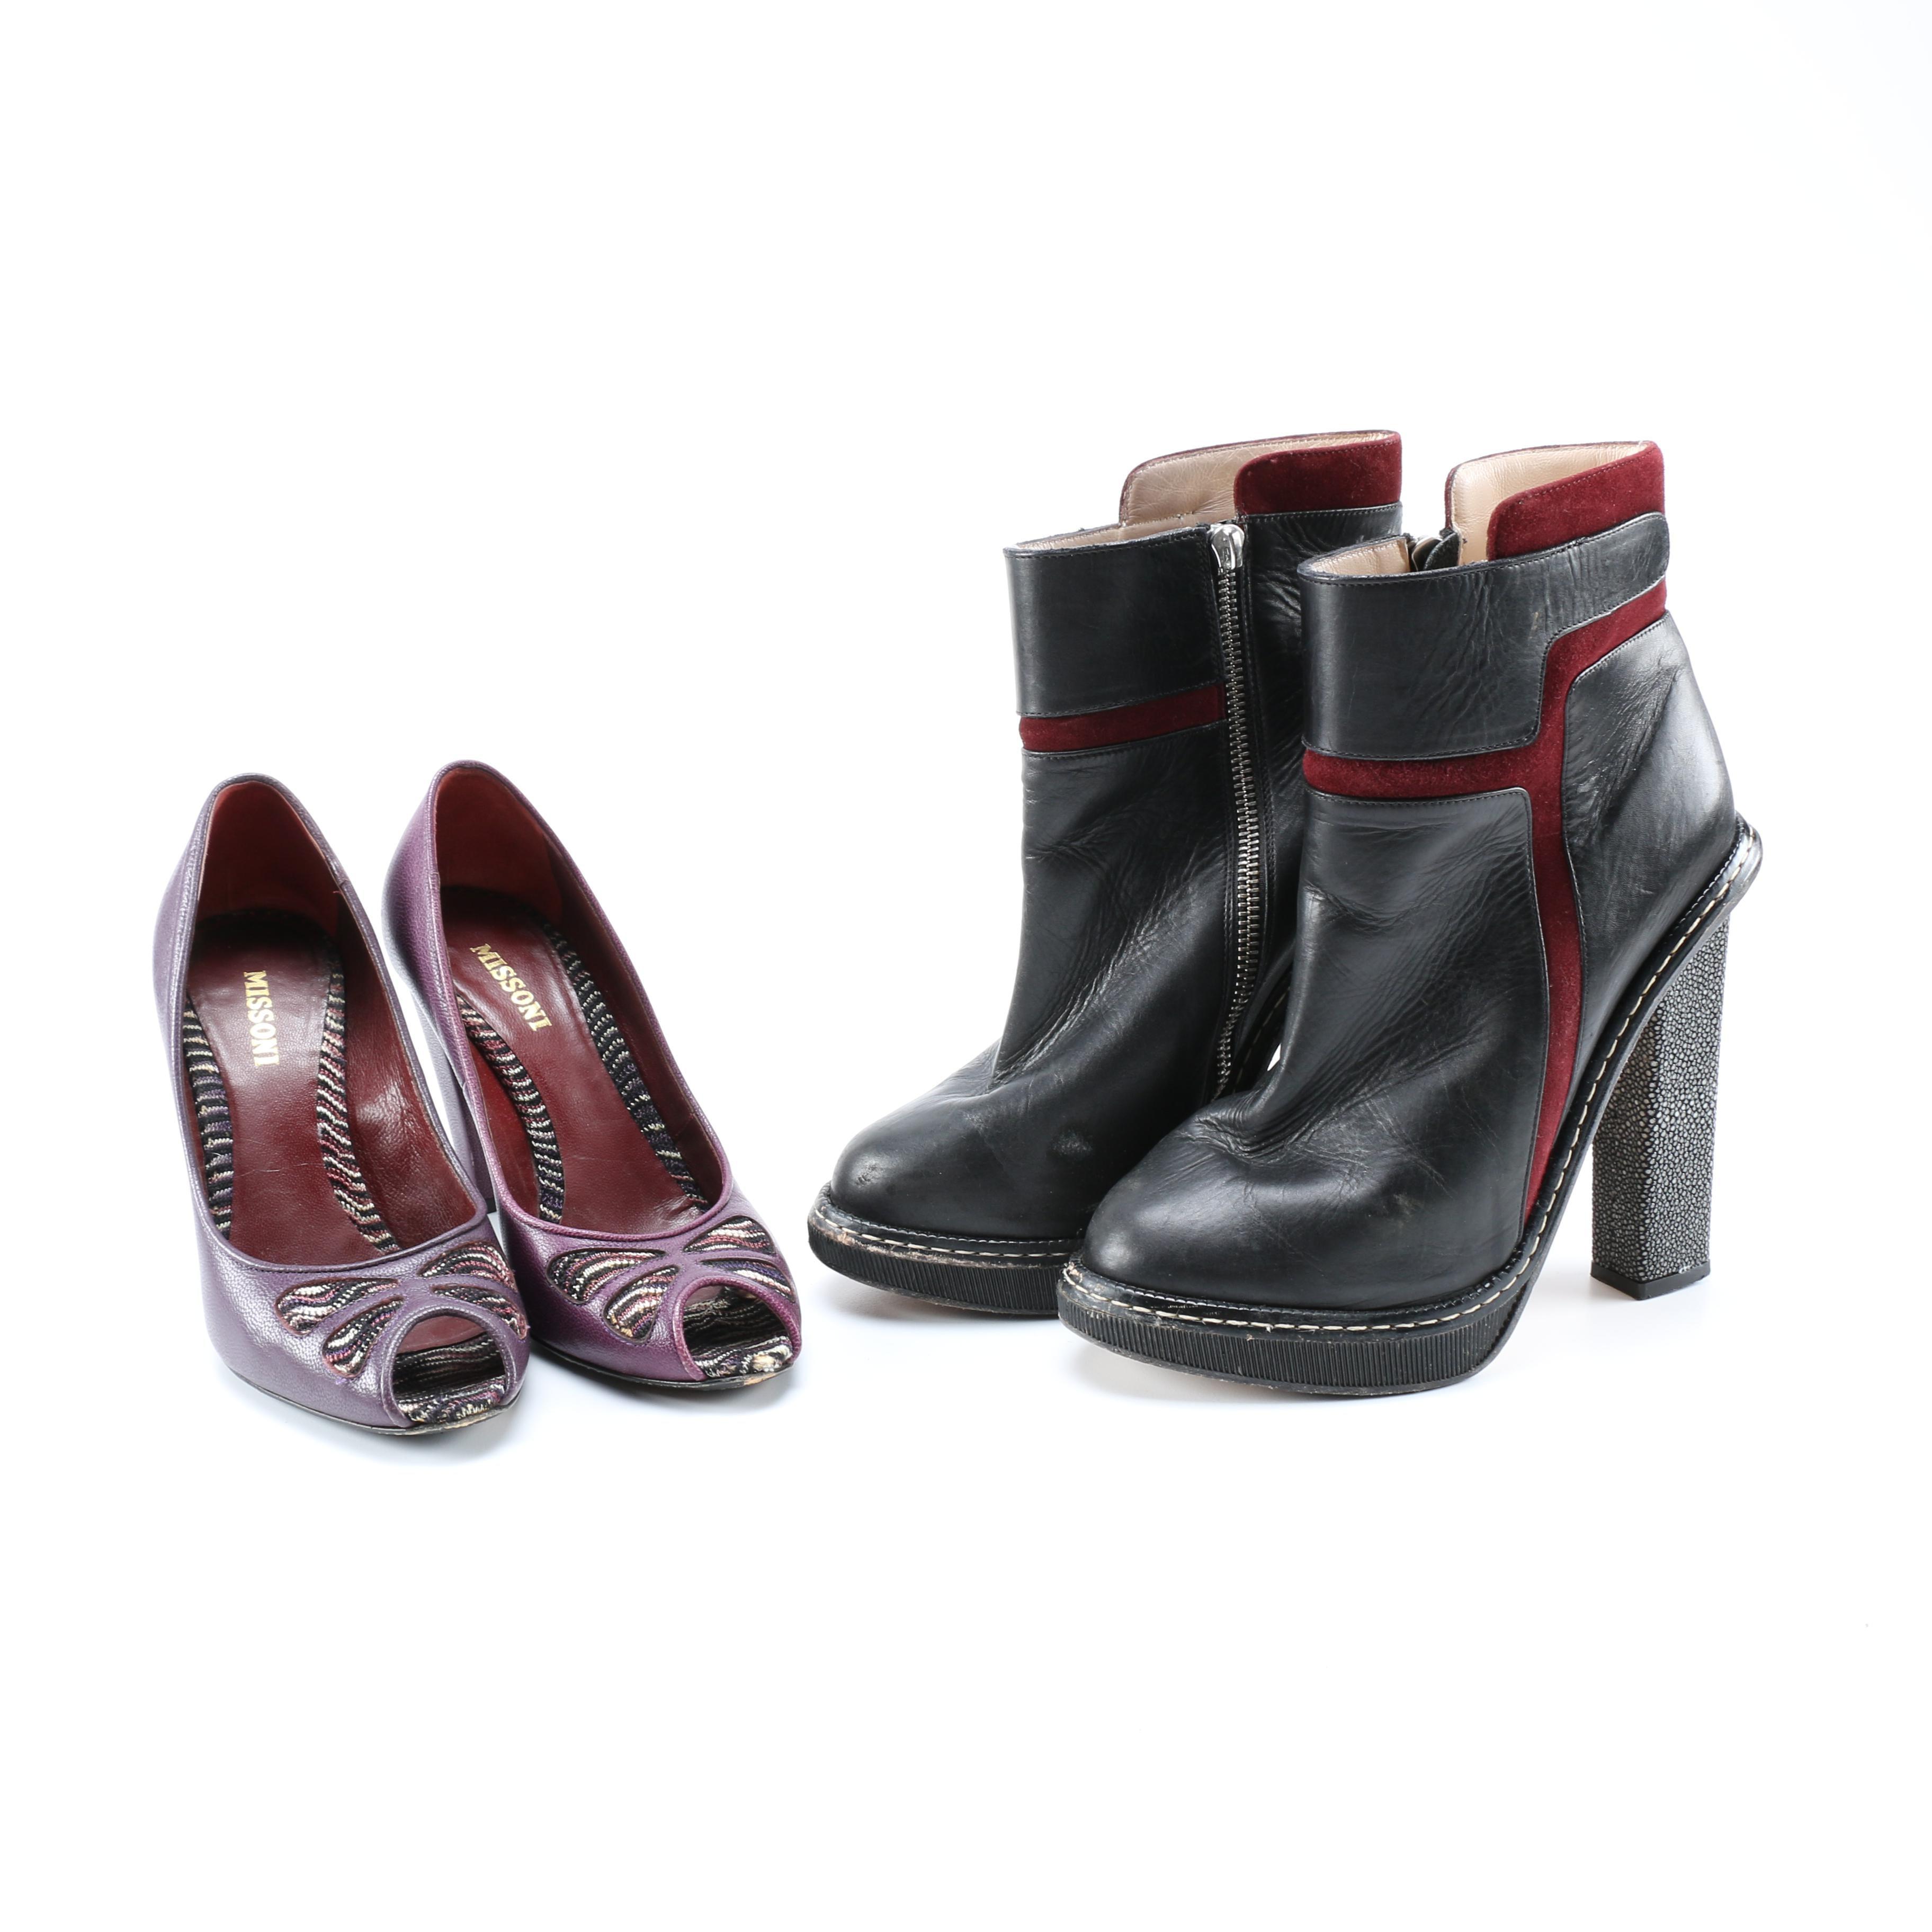 "Chrissie Morris ""Obi"" Stingray Ankle Boots and Missoni Peep Toe Pumps"